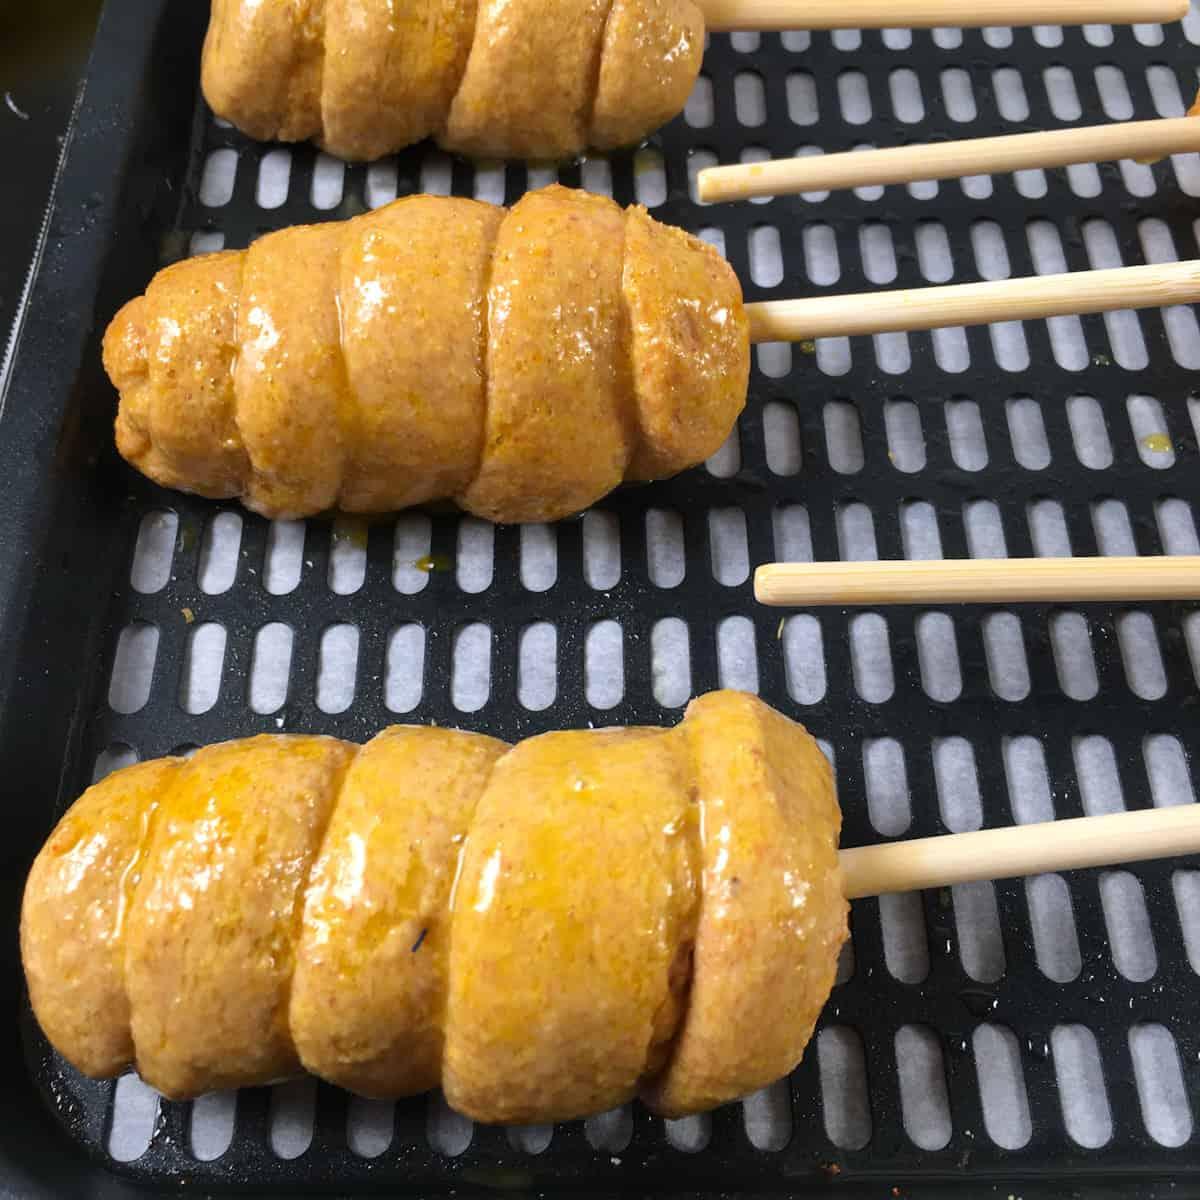 corn dogs air fryer